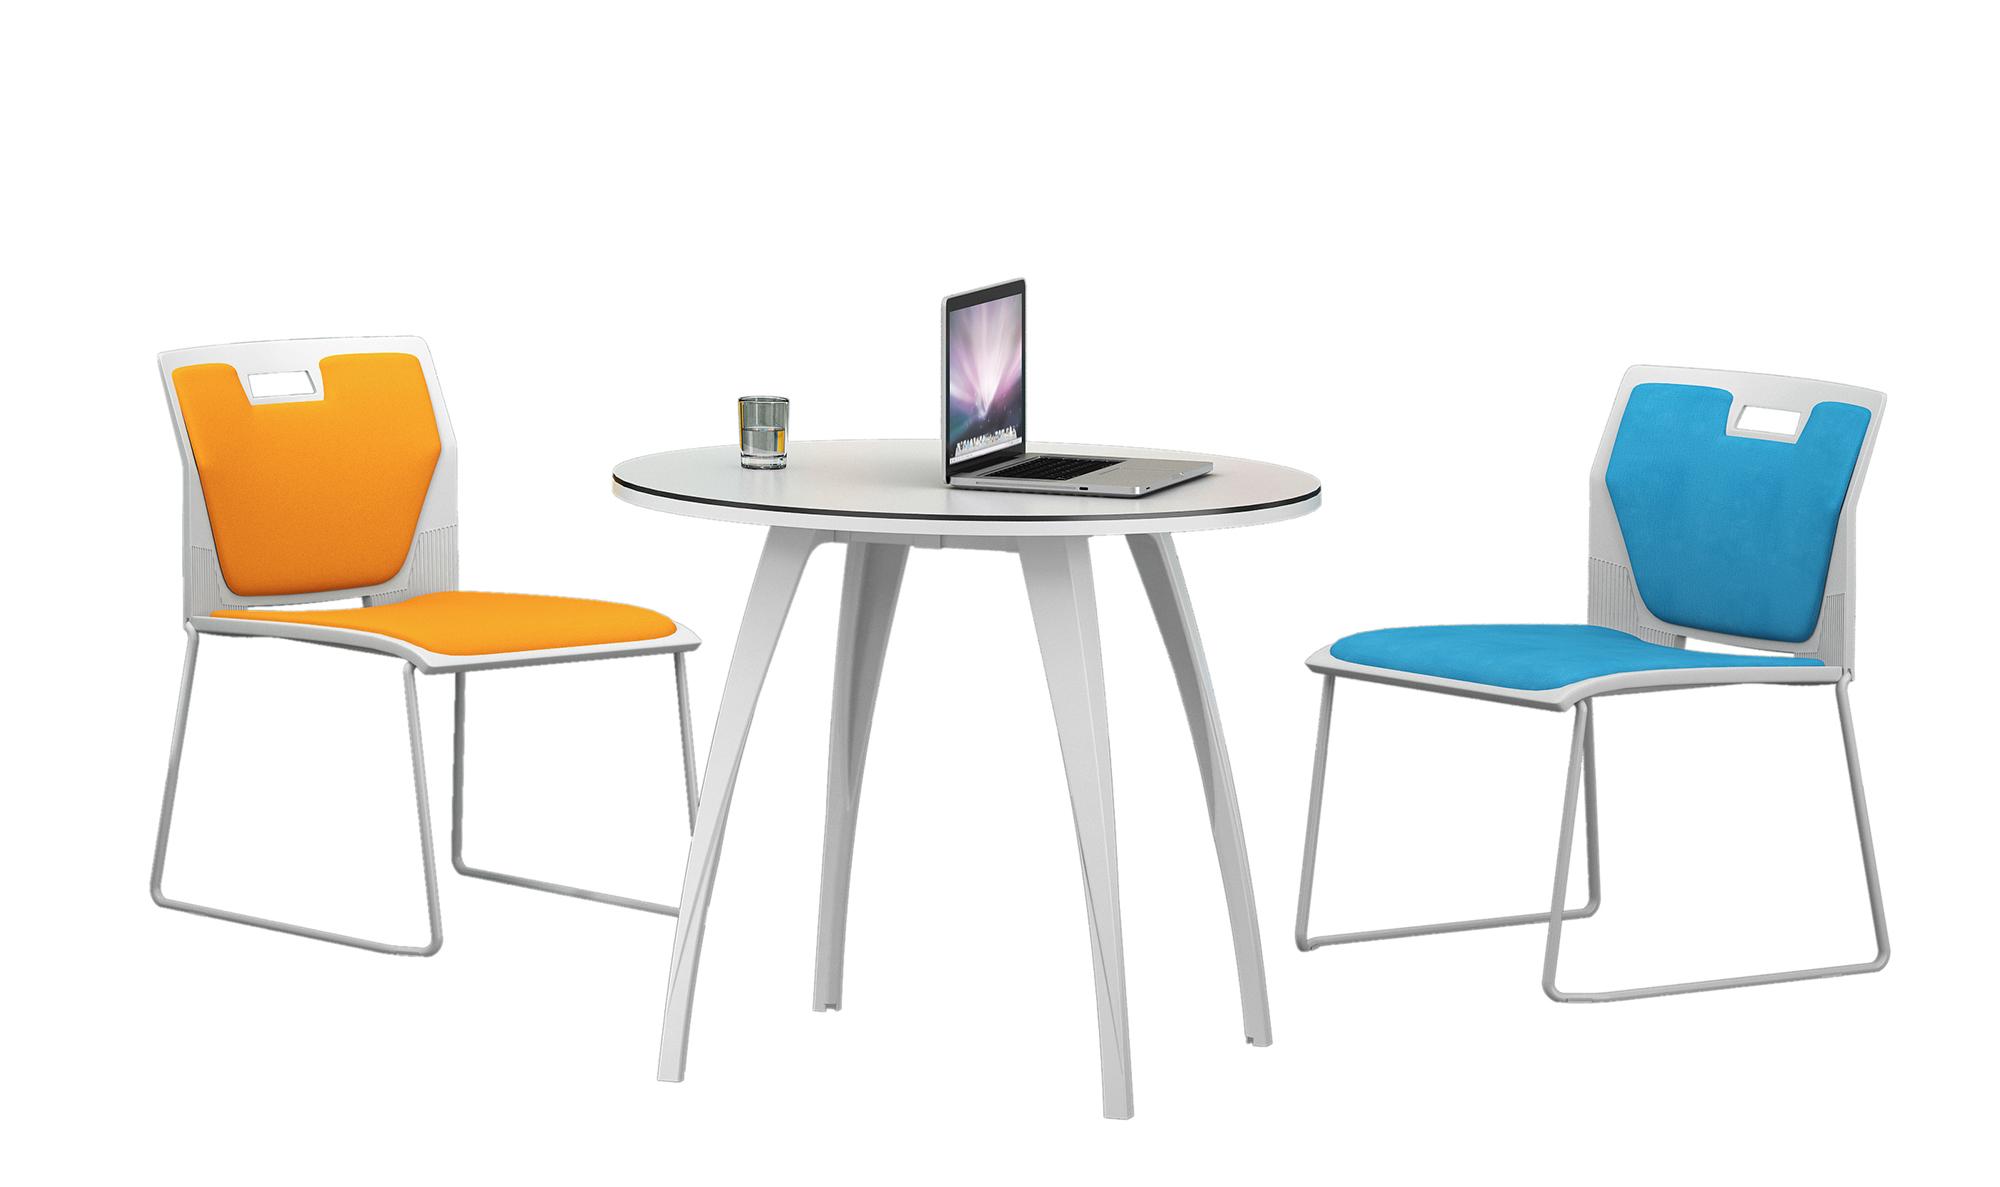 NE -08HQ Small meeting table